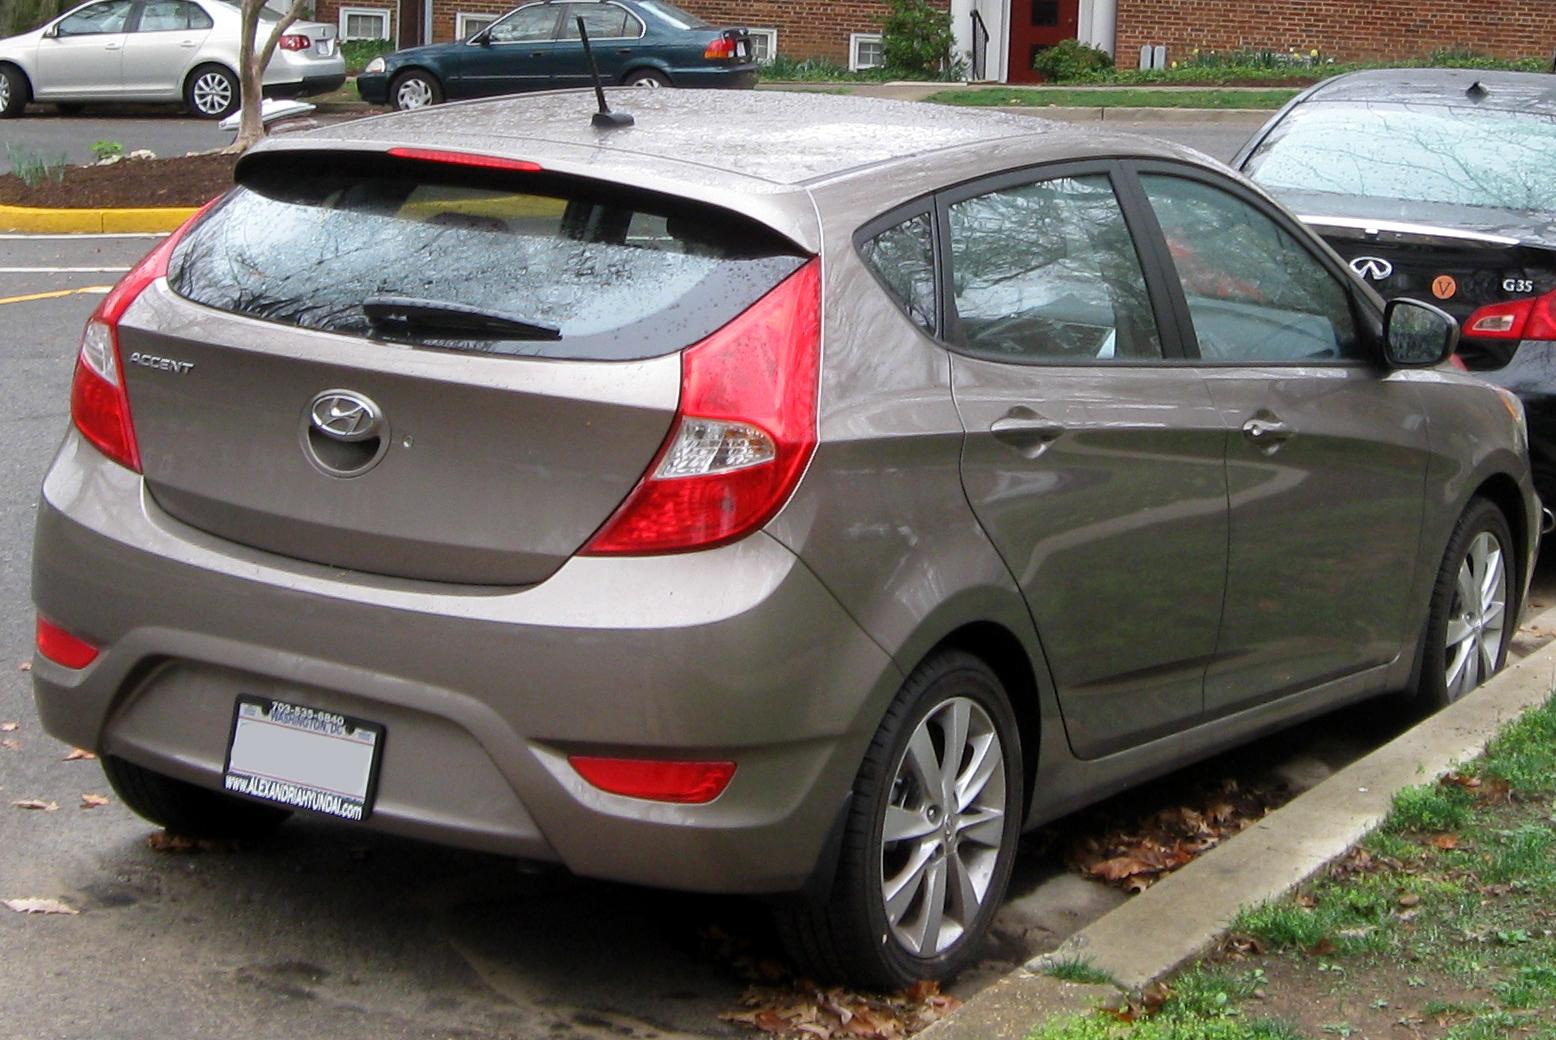 File:2012 Hyundai Accent SE Hatchback    03 21 2012.JPG